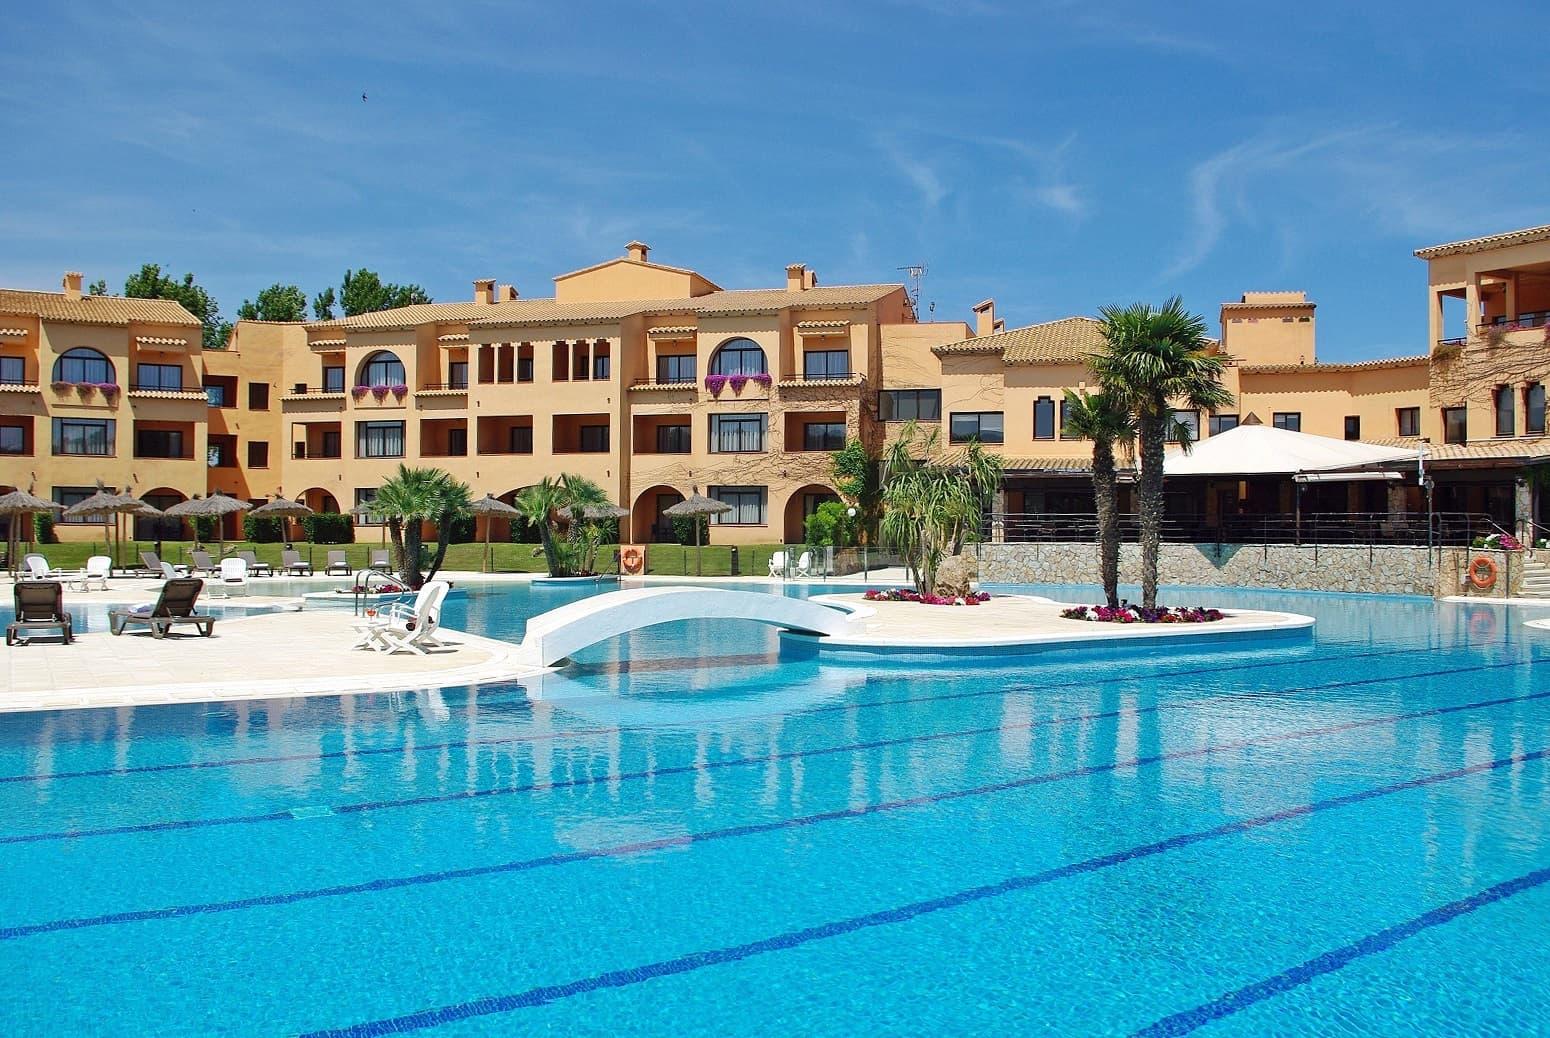 serveis/instalacions/hlc_piscina_vista-terrassa-restaurant_2000pxls.jpg